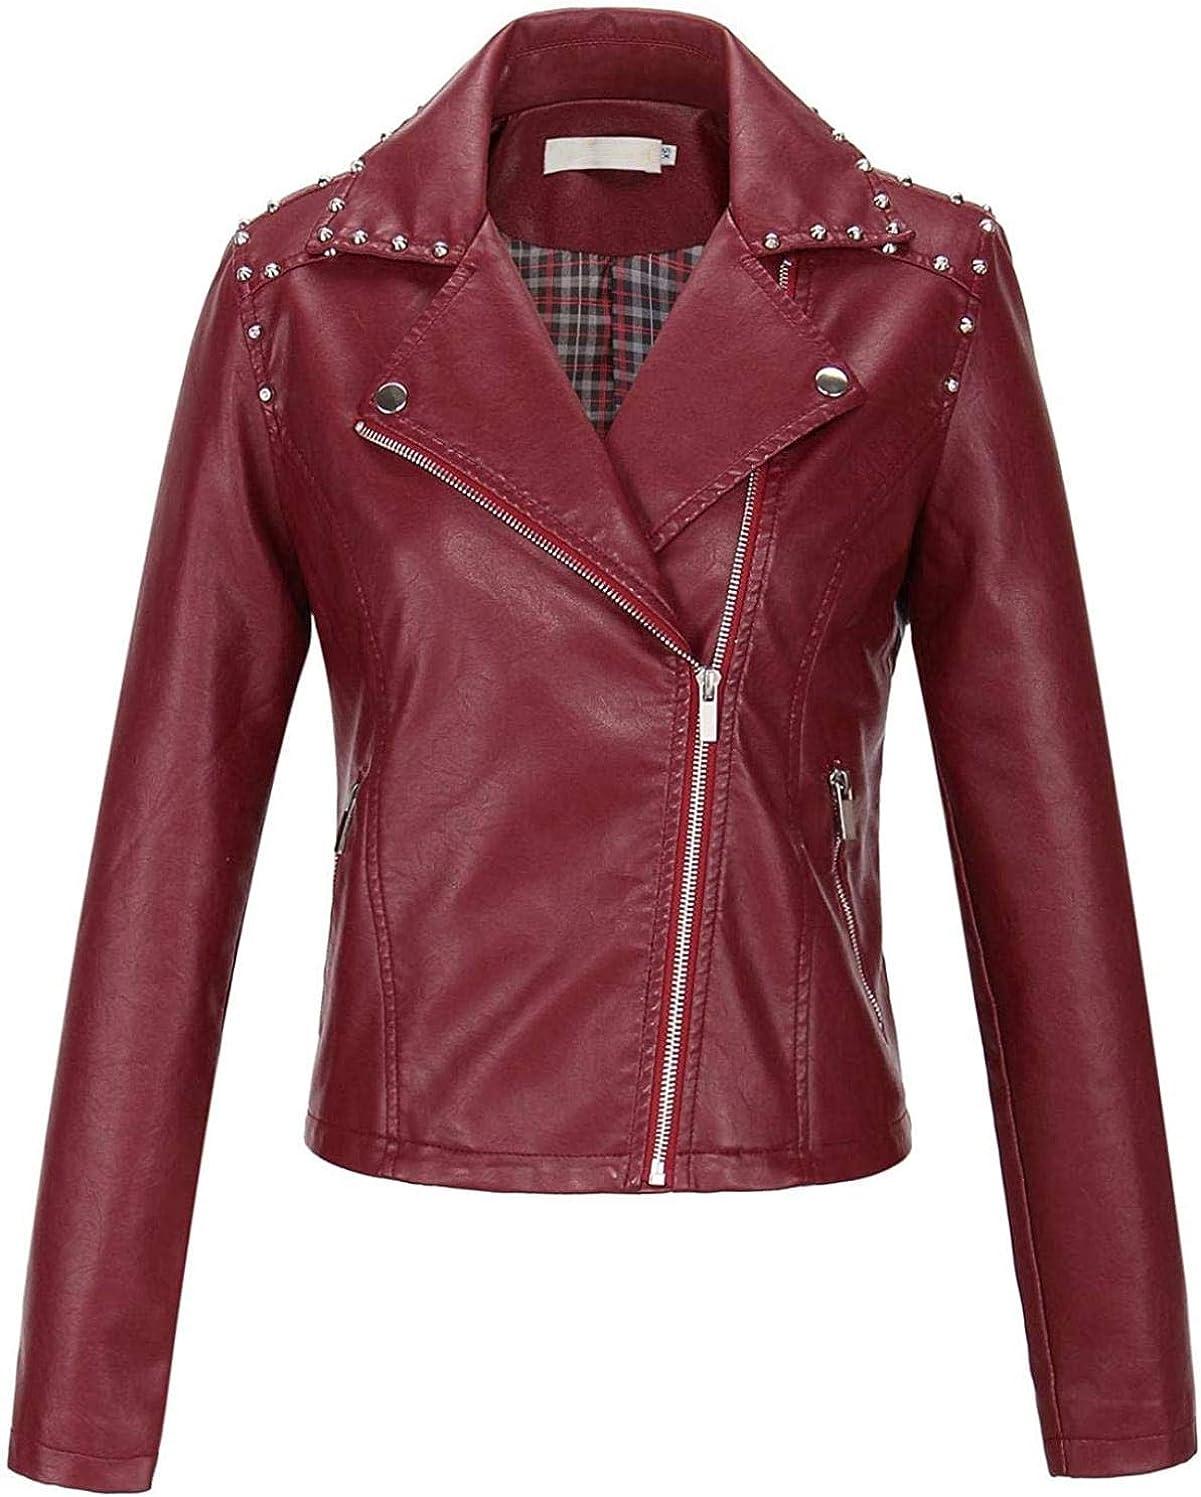 Women's Embroidery Crane Faux Leather Studded Moto Biker Jacket